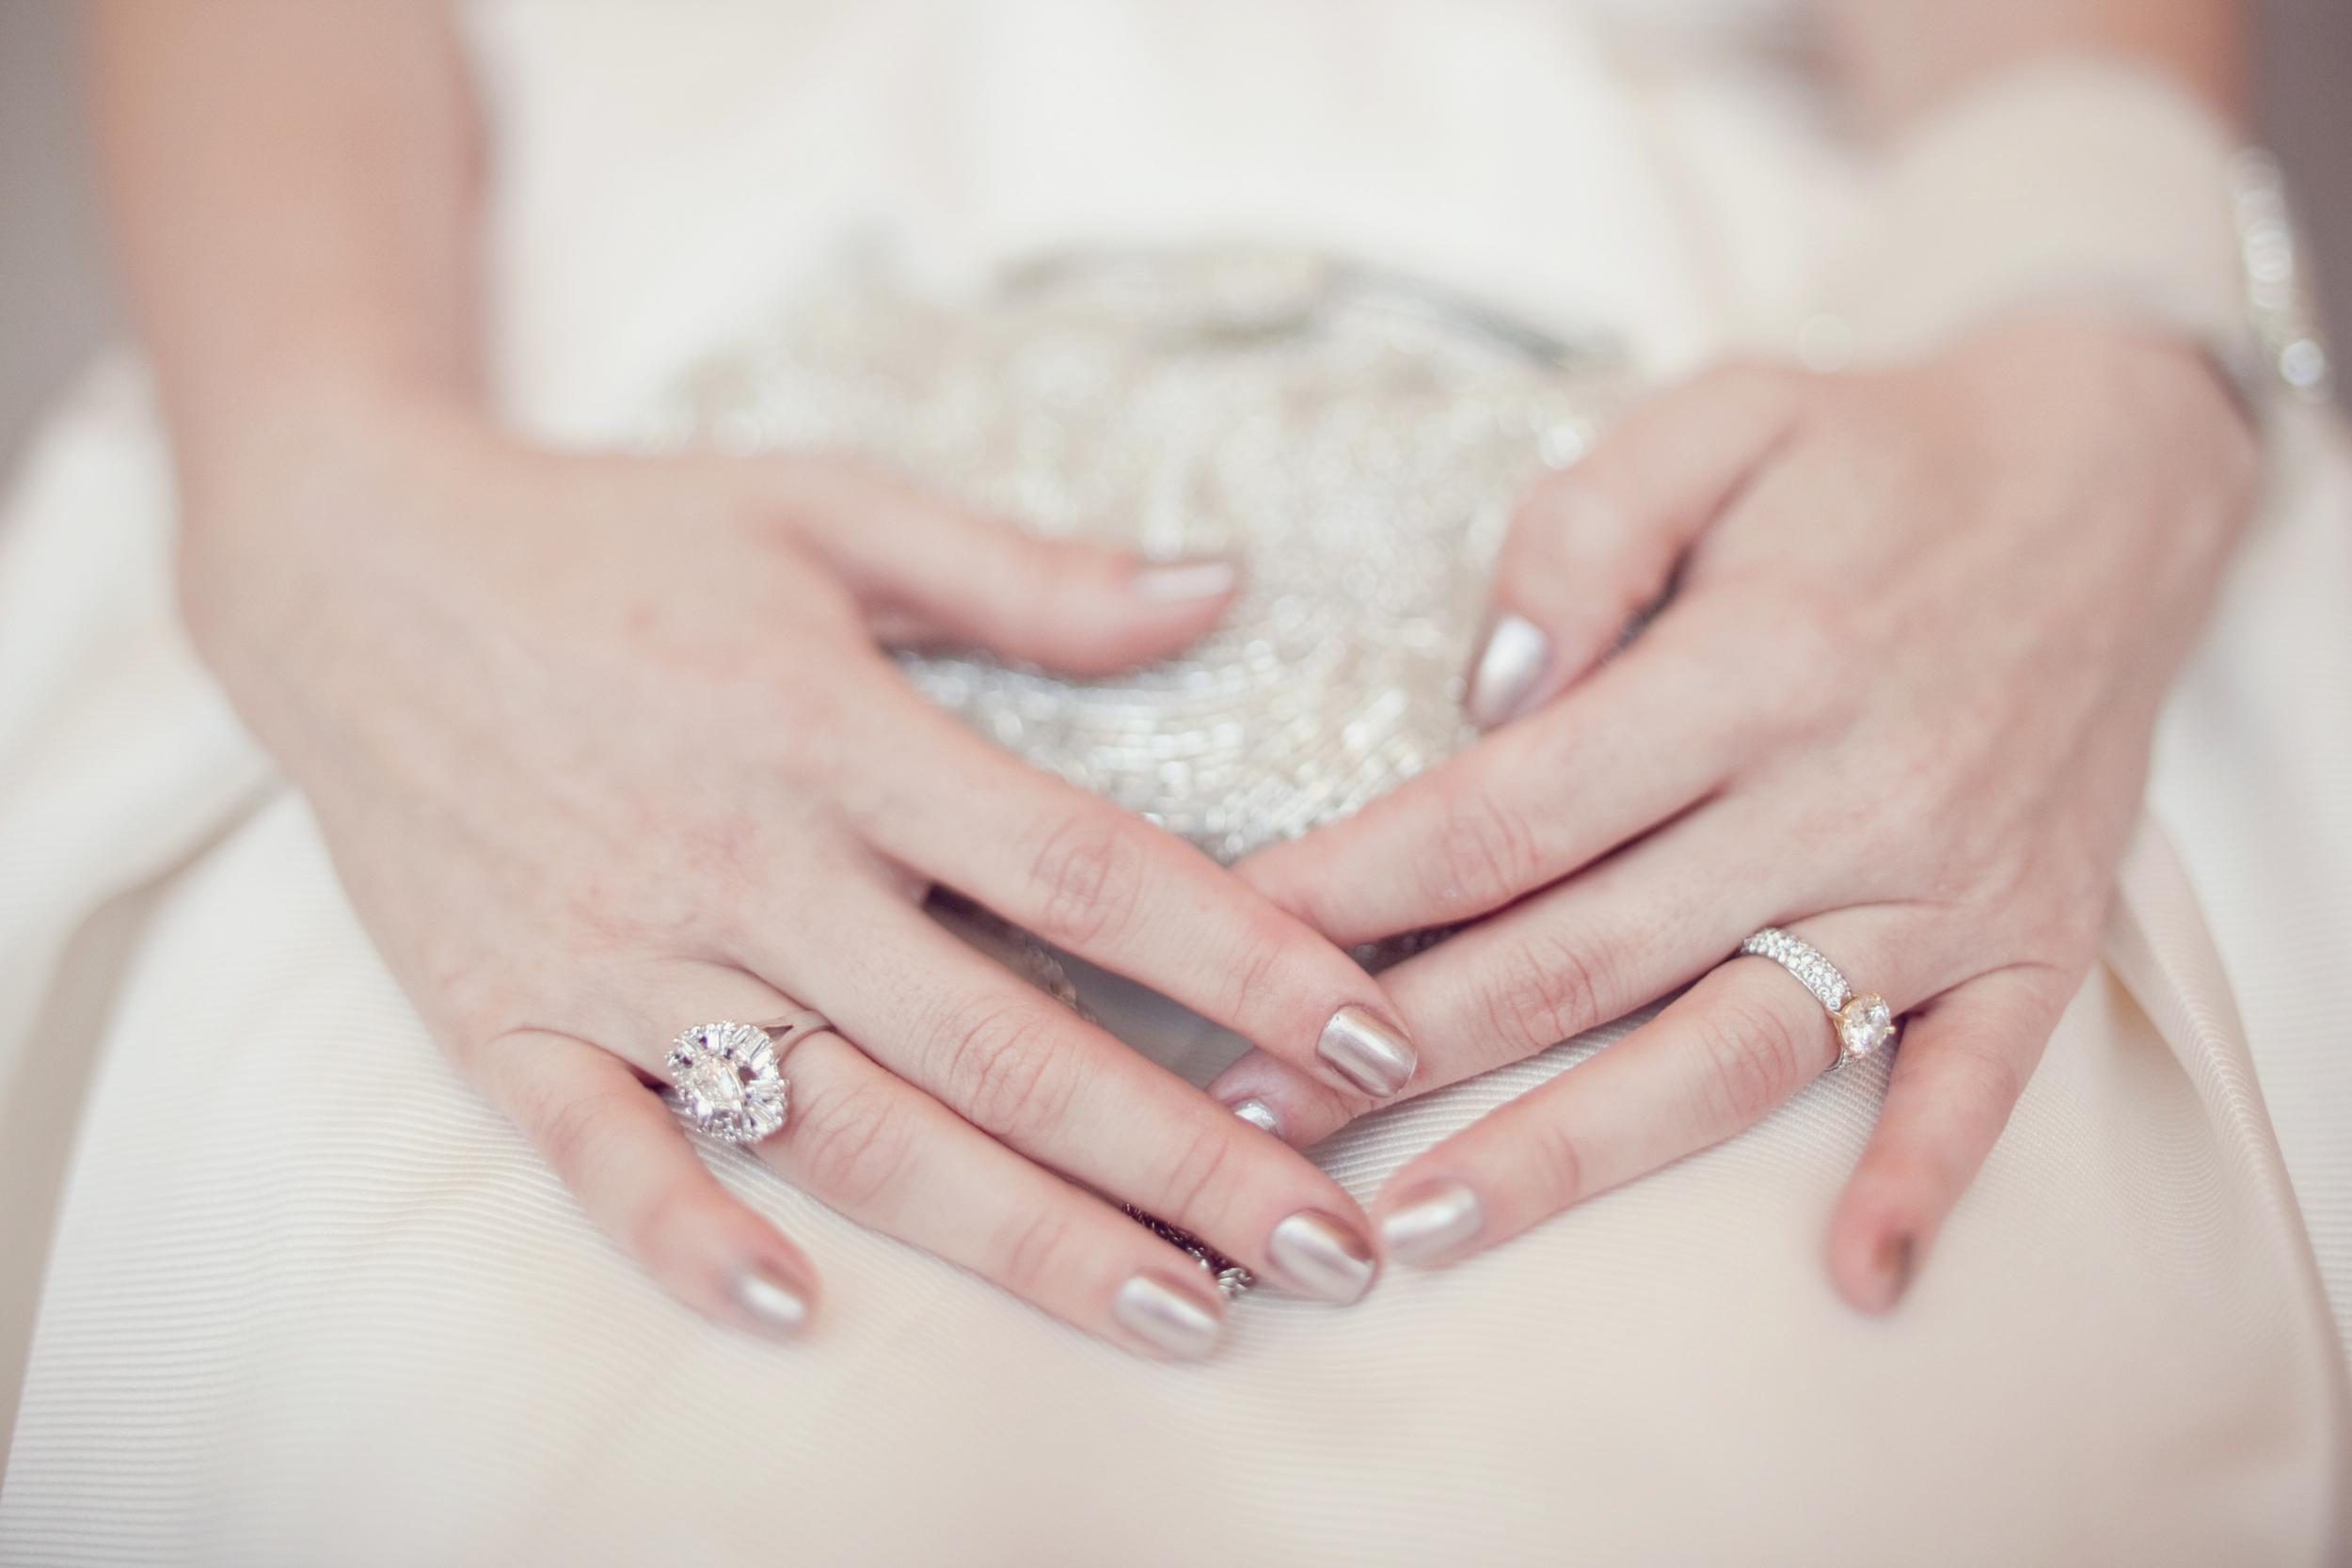 San_Francisco_City_Hall_Wedding_Photography_Cori_EB-02.JPG